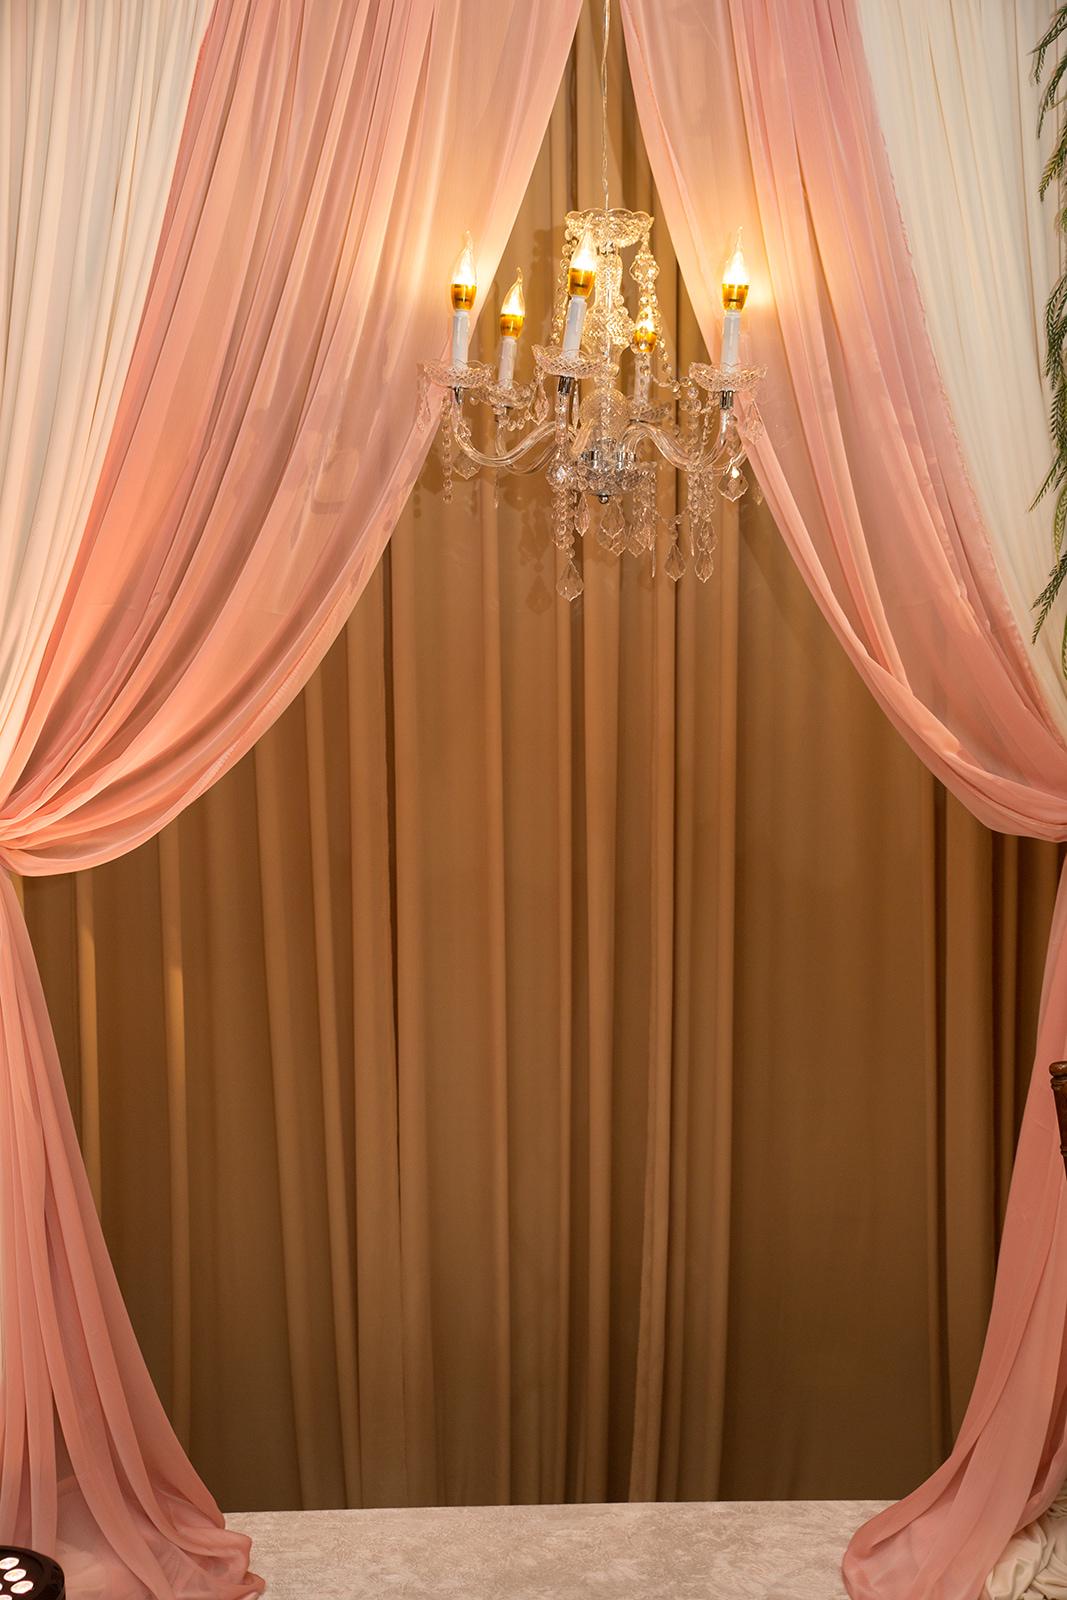 Le Cape Weddings - Sumeet and Chavi - Reception Details  -49.jpg